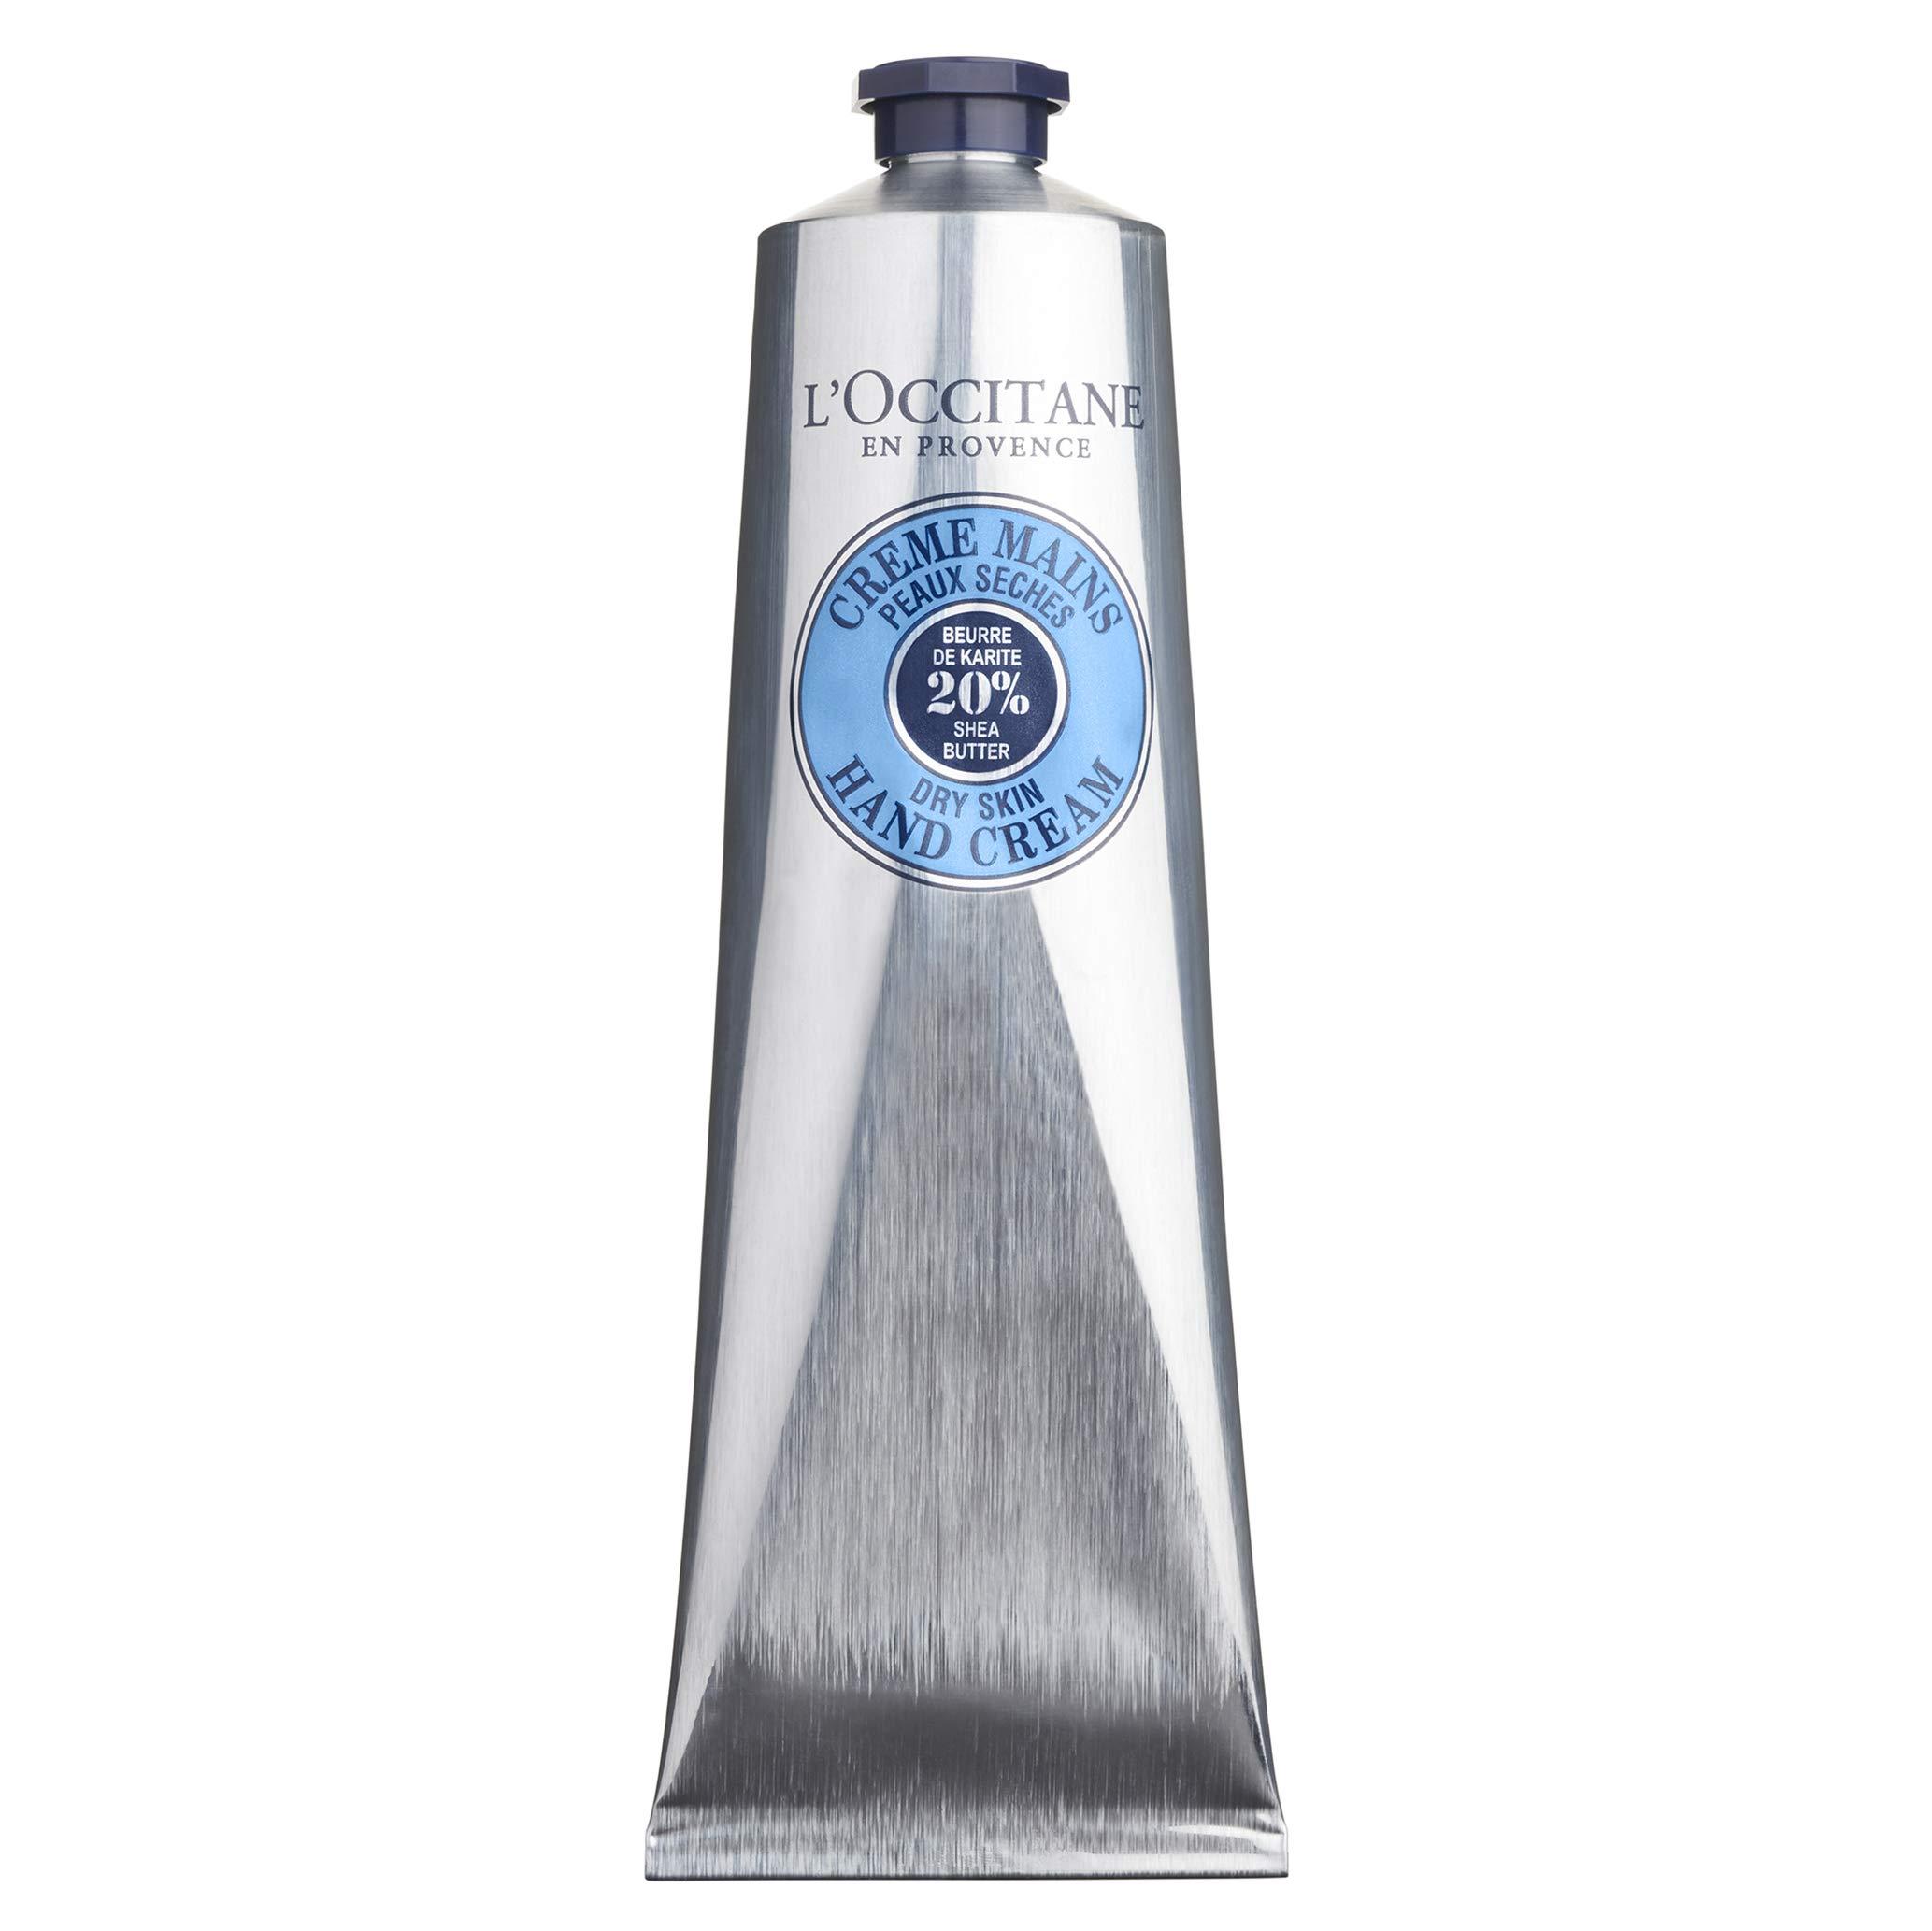 L'Occitane Fast-Absorbing 20% Shea Butter Hand Cream, 5.2 fl. oz. by L'Occitane